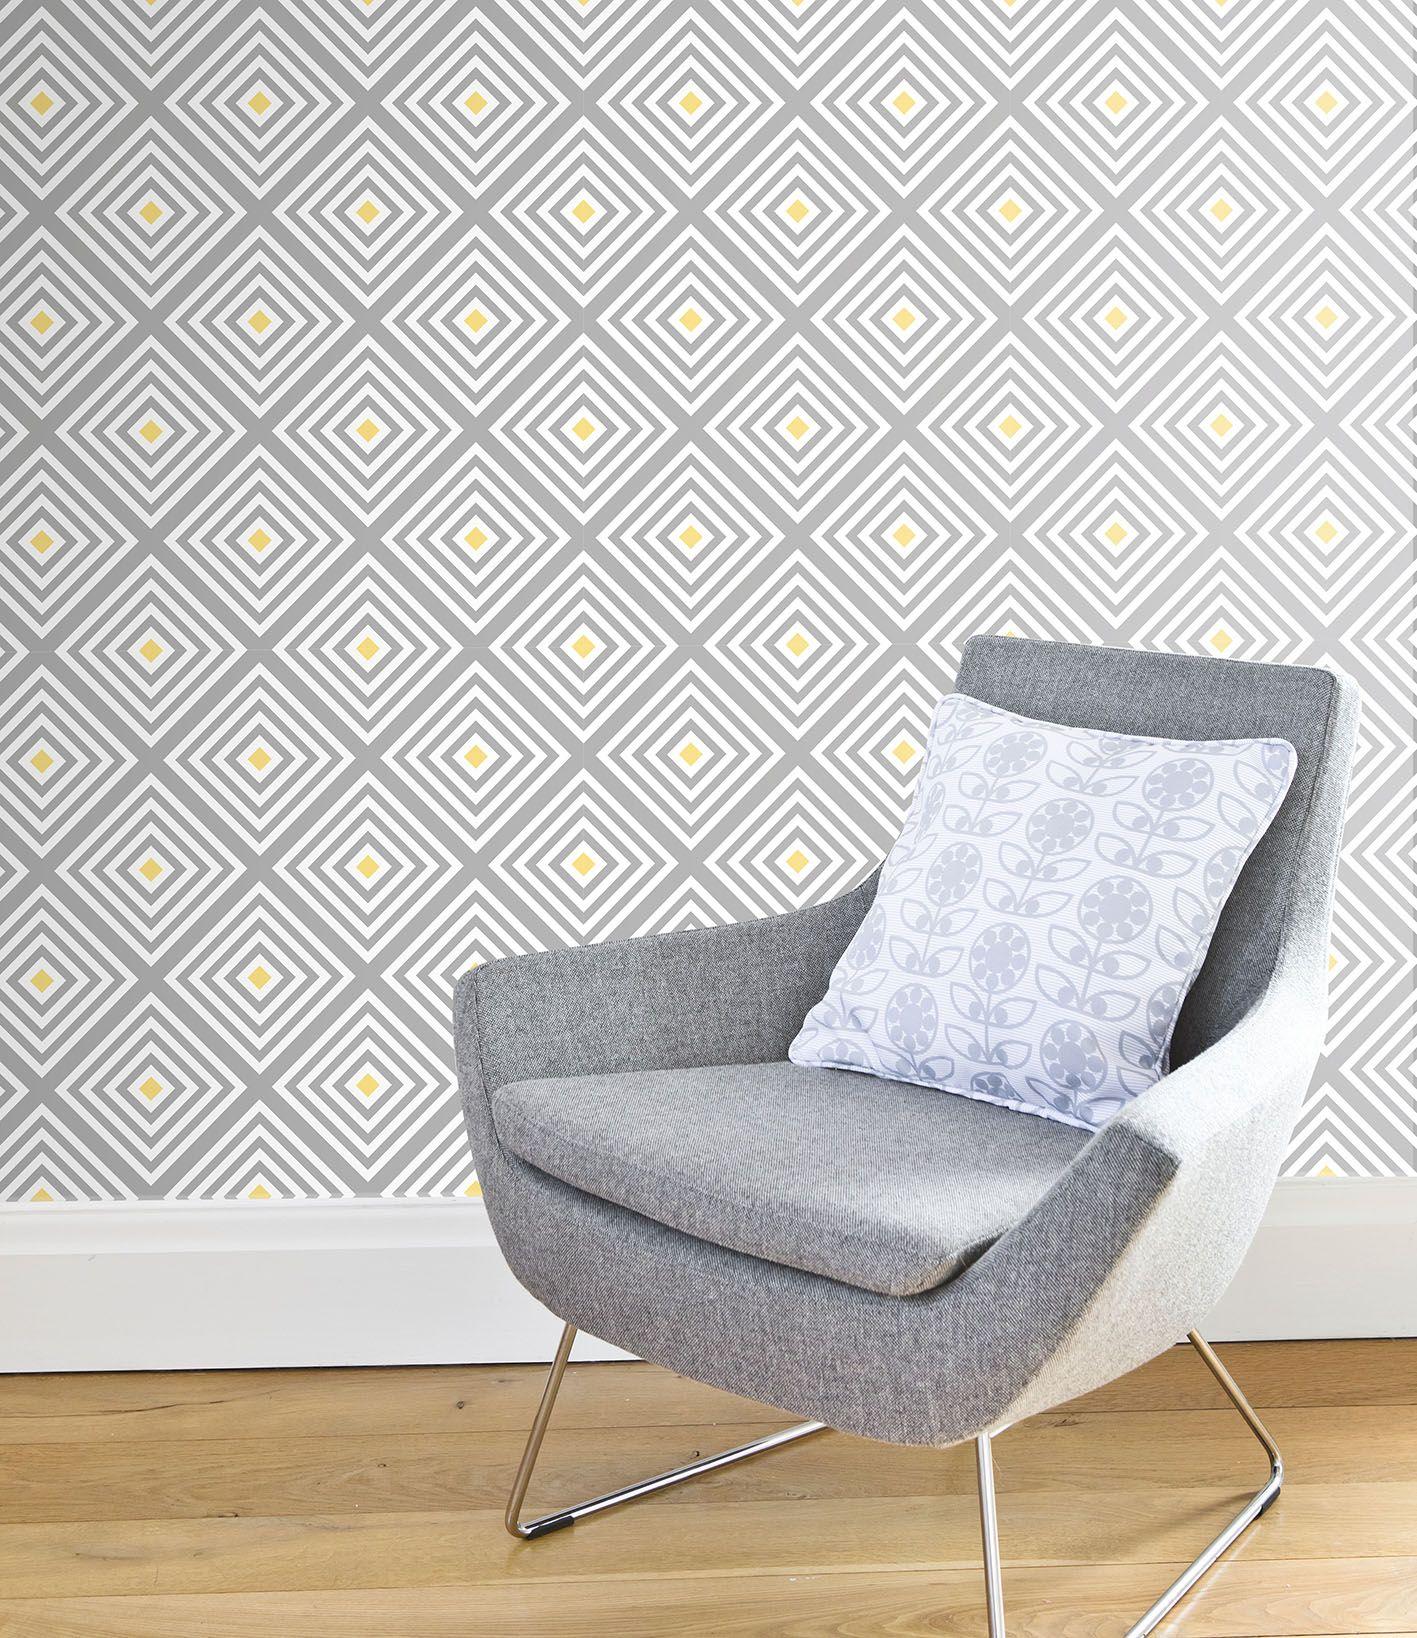 Diamond Wallpaper From Layla Faye Laylafaye Retro Modern And Mid Century Designs